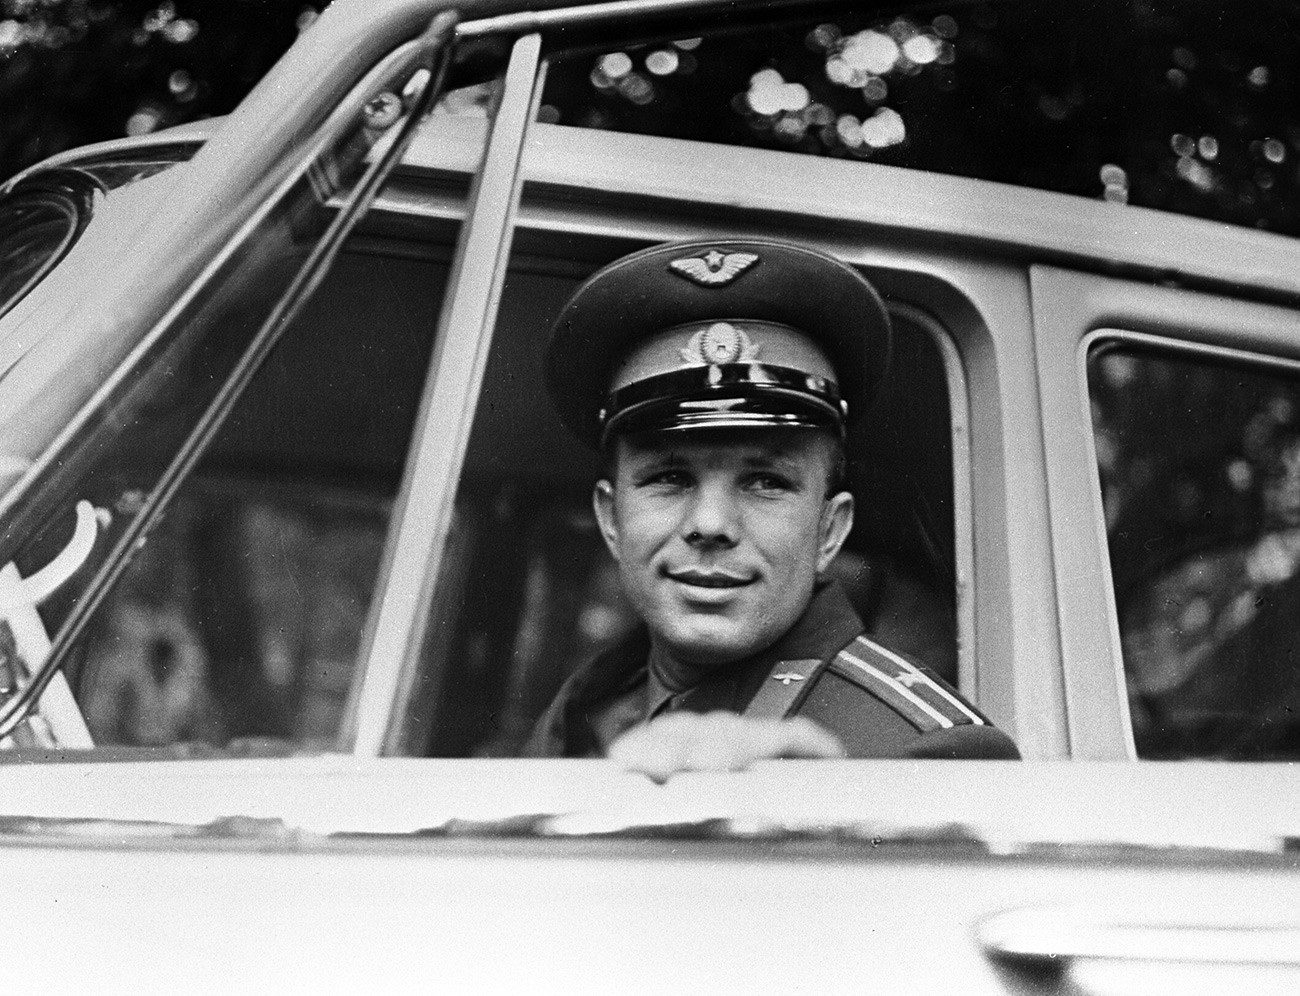 Yuri Gagarin, the first man in space.